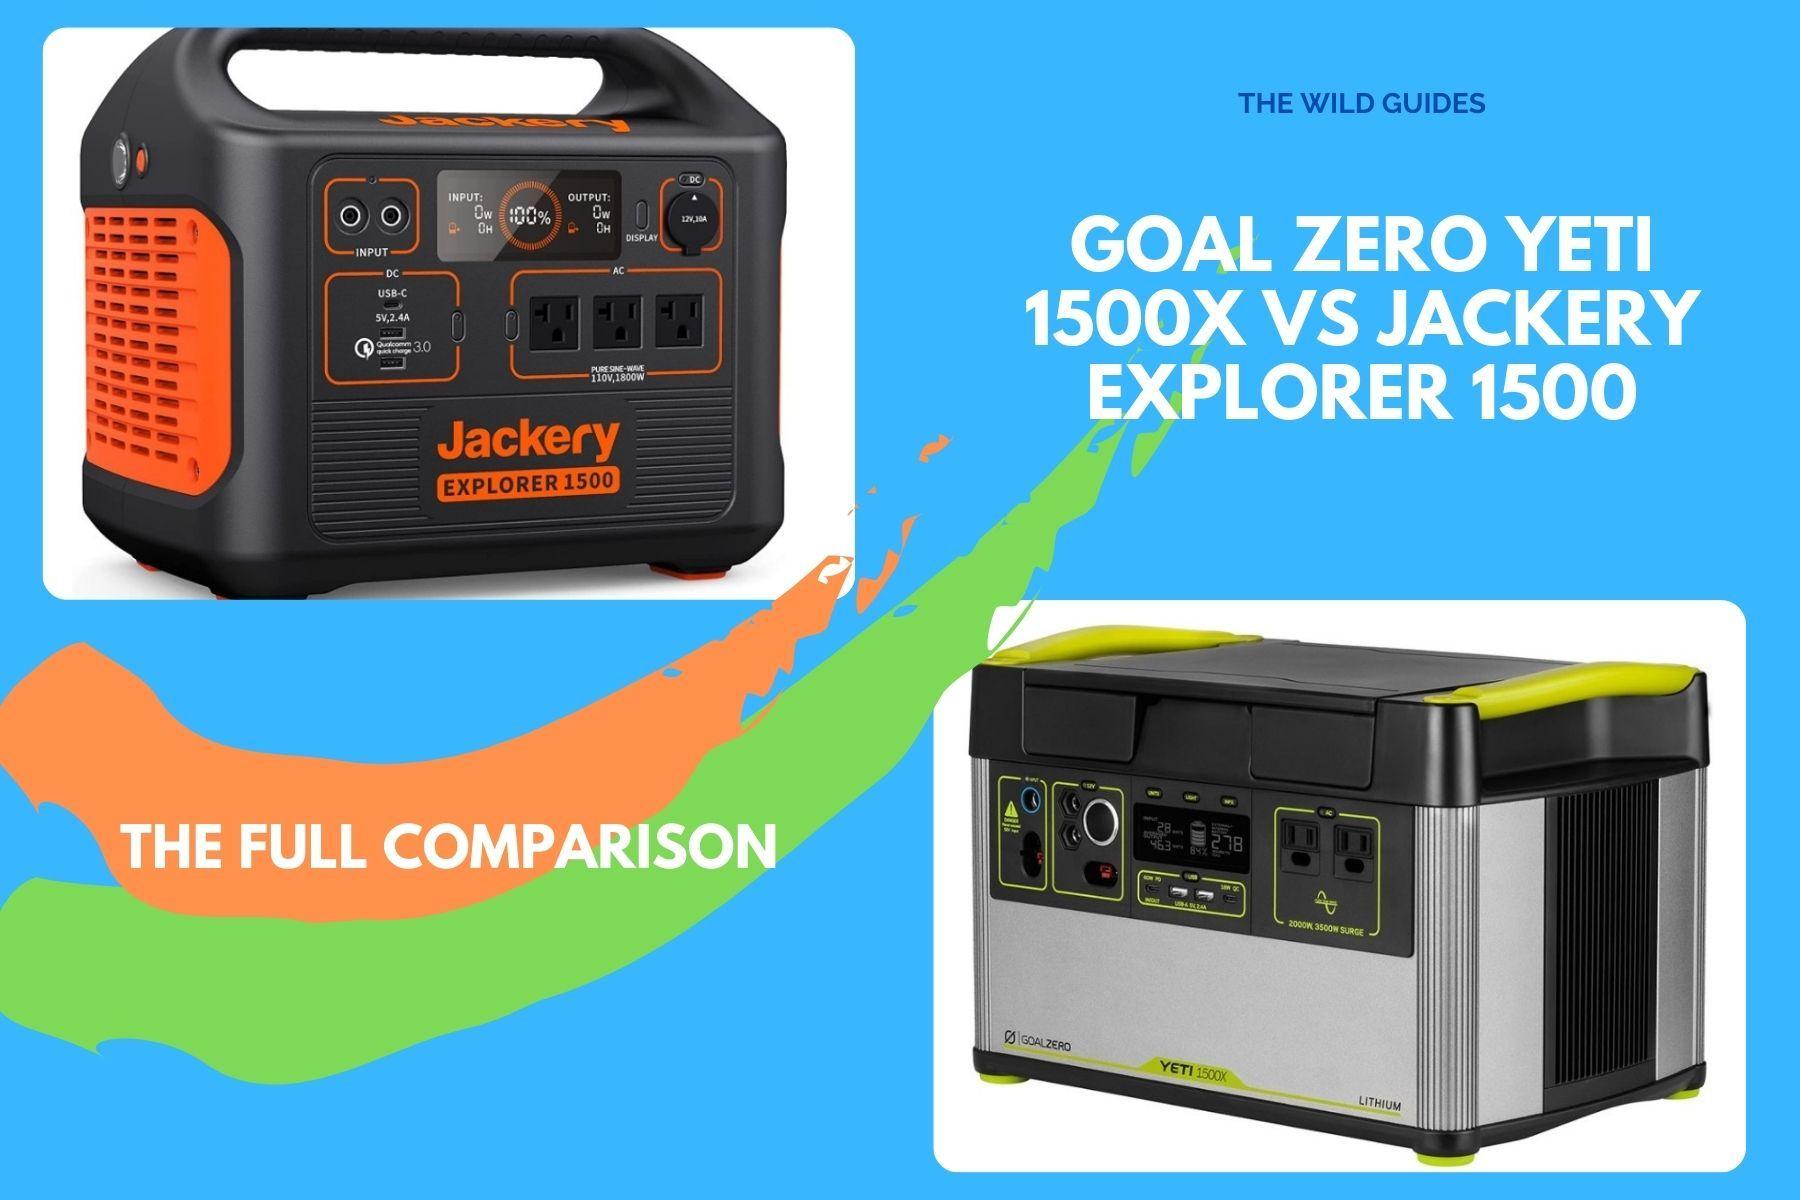 Goal Zero Yeti 1500X vs Jackery Explorer 1500: Full Comparison